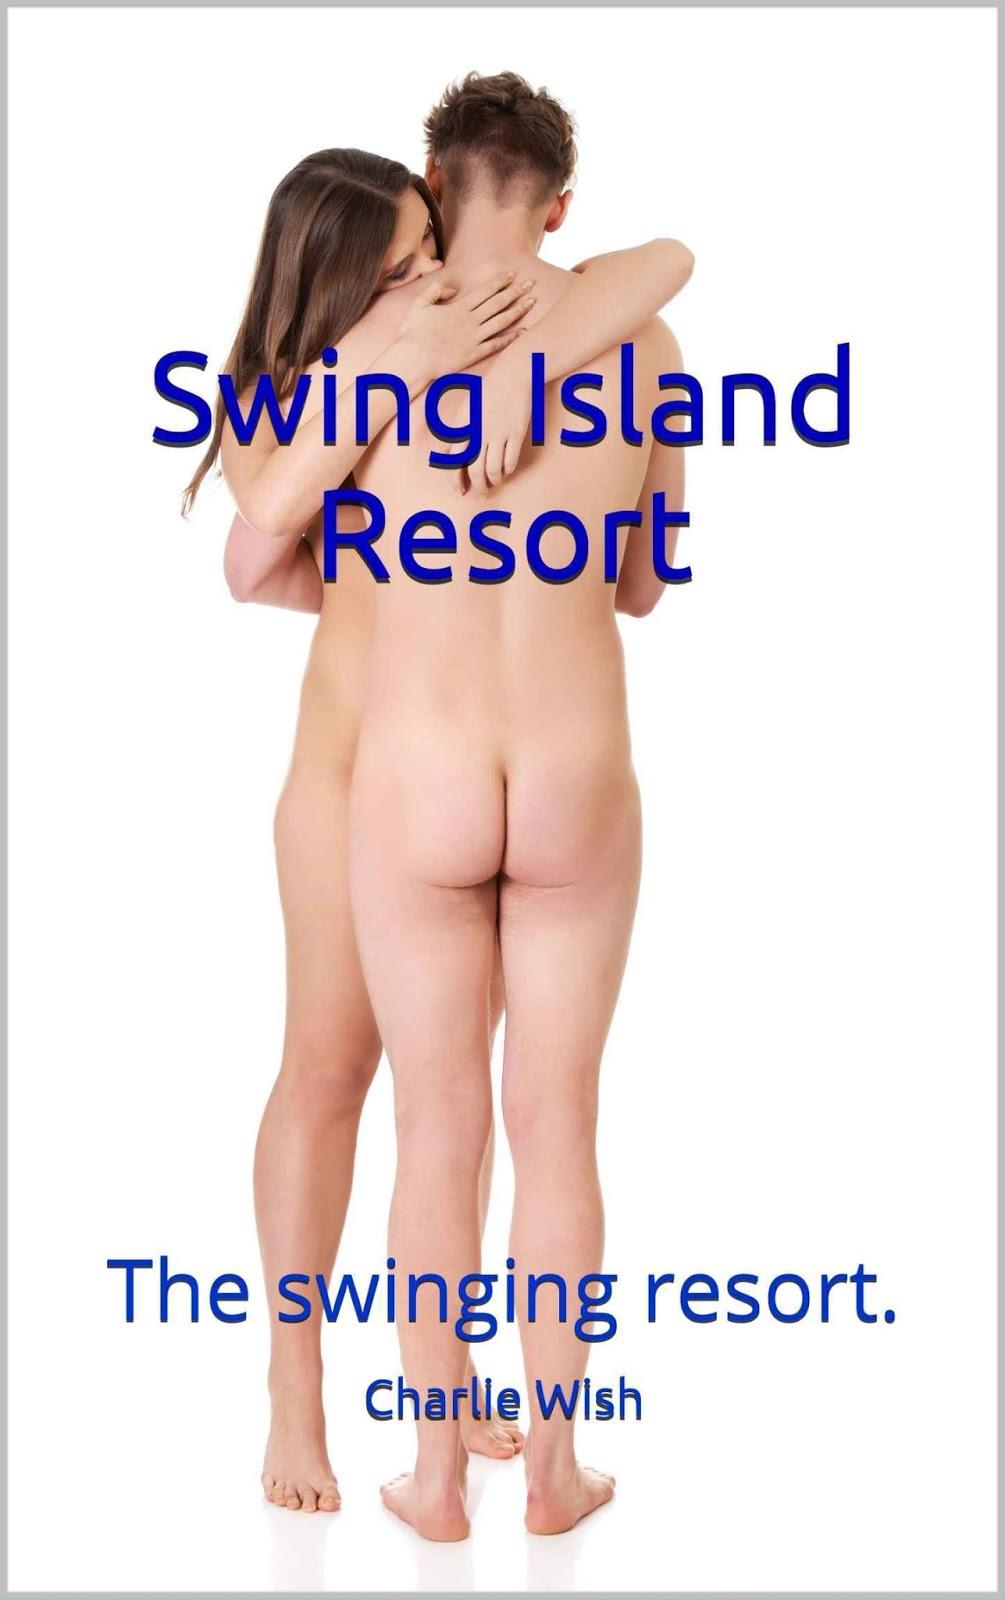 The swinging resort